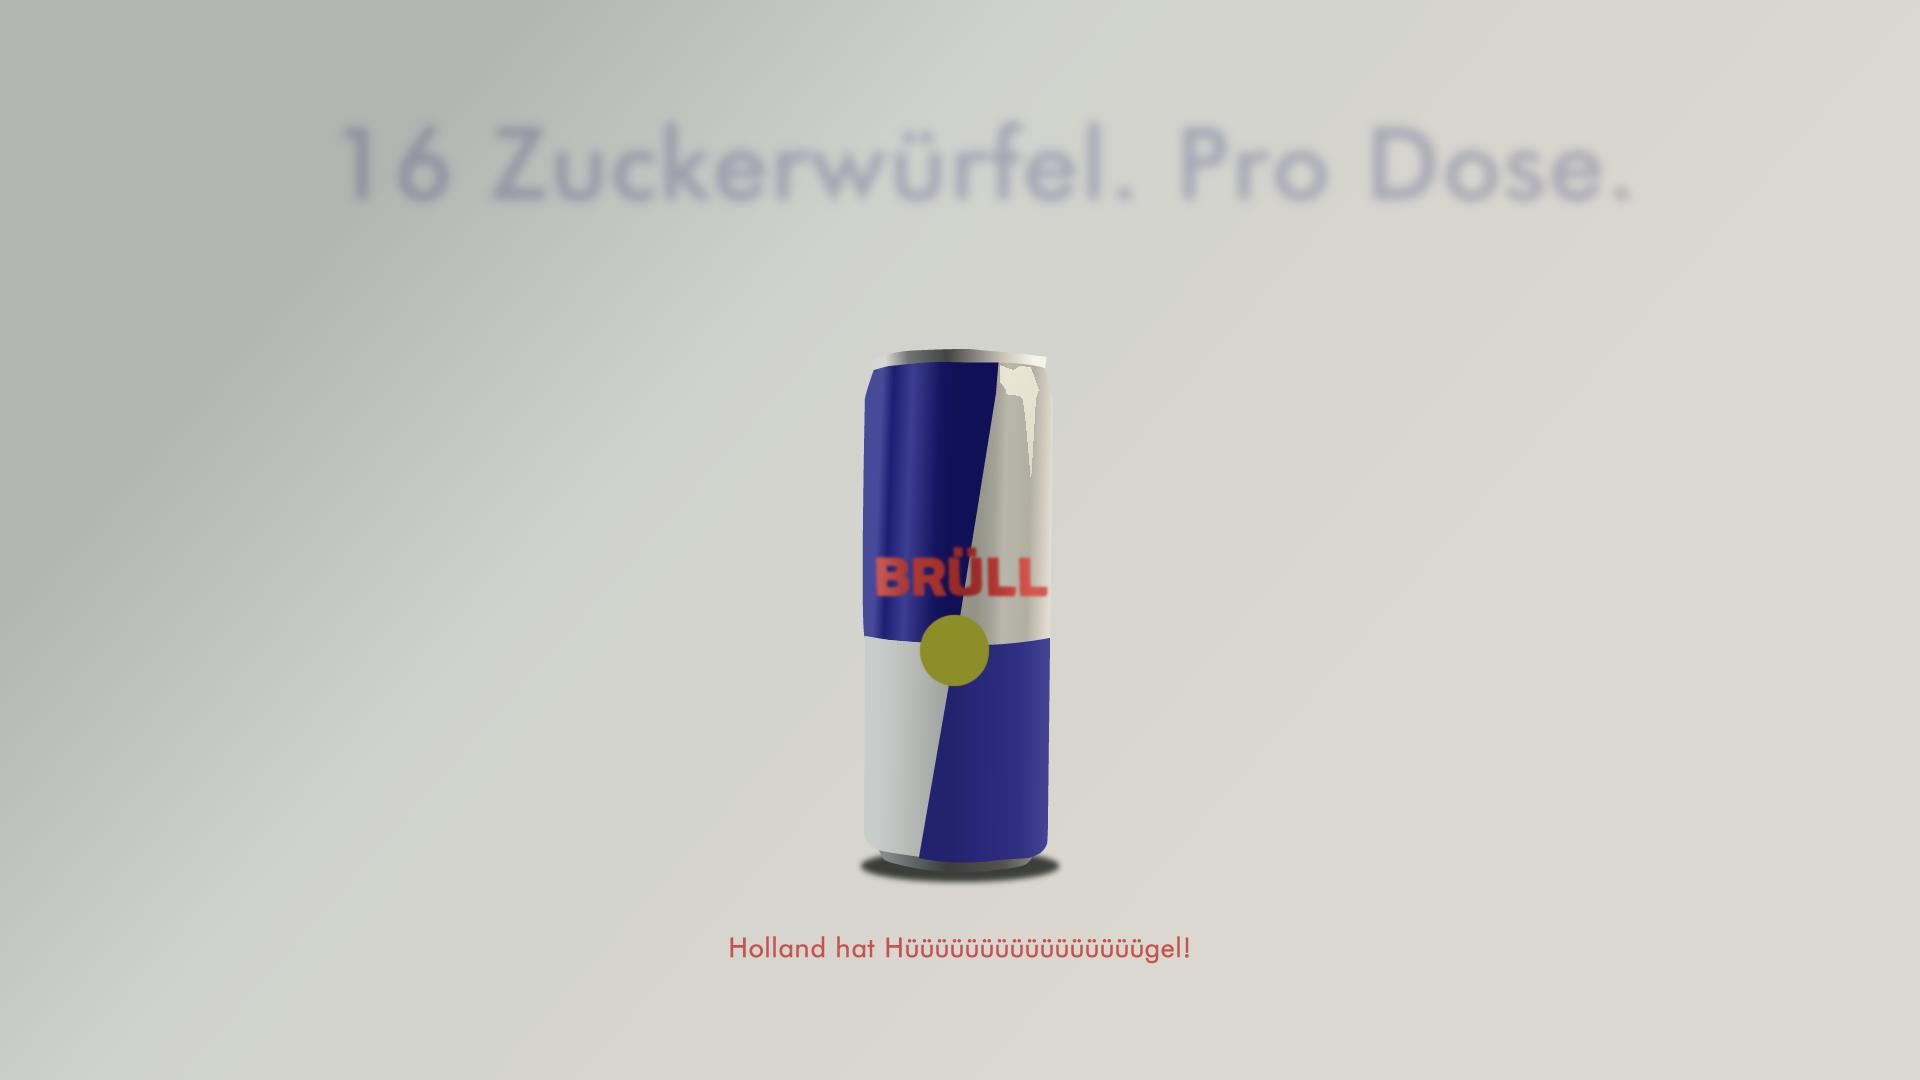 Red Bull Kühlschrank Anleitung : Nicodavinci slowcarb experte und futter rebell